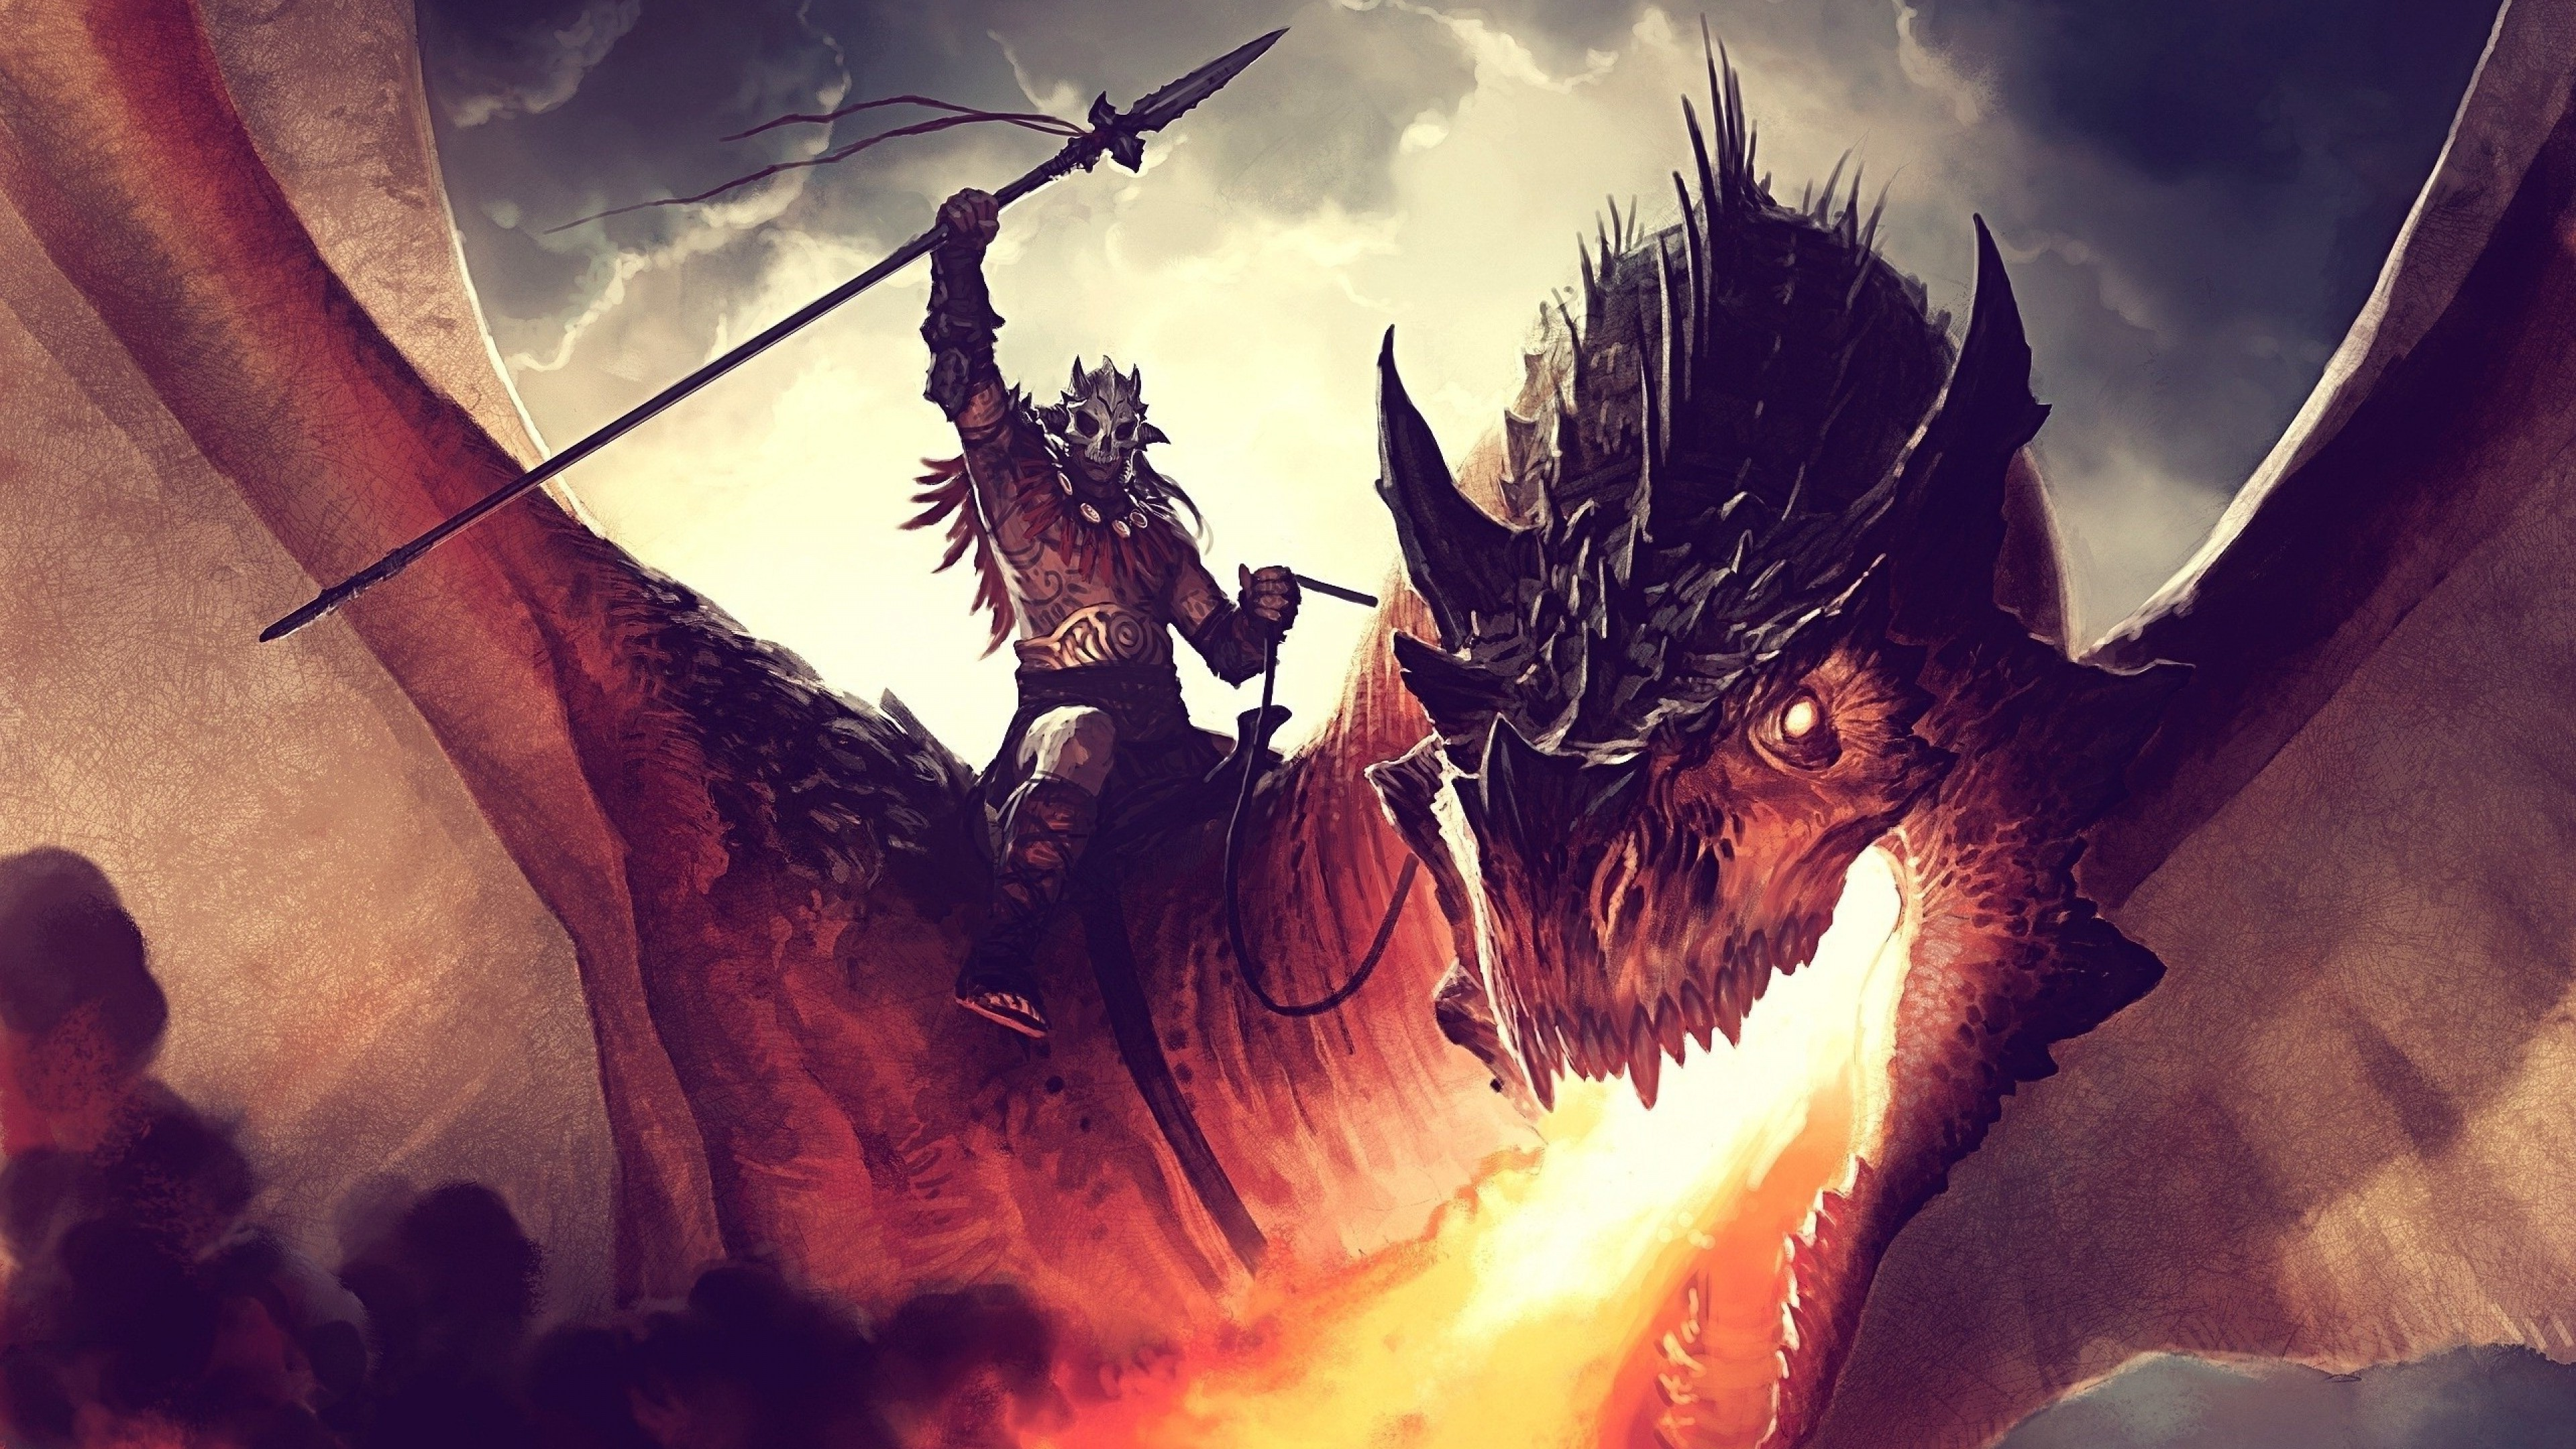 Dragon Warrior Wallpaper 74 Pictures